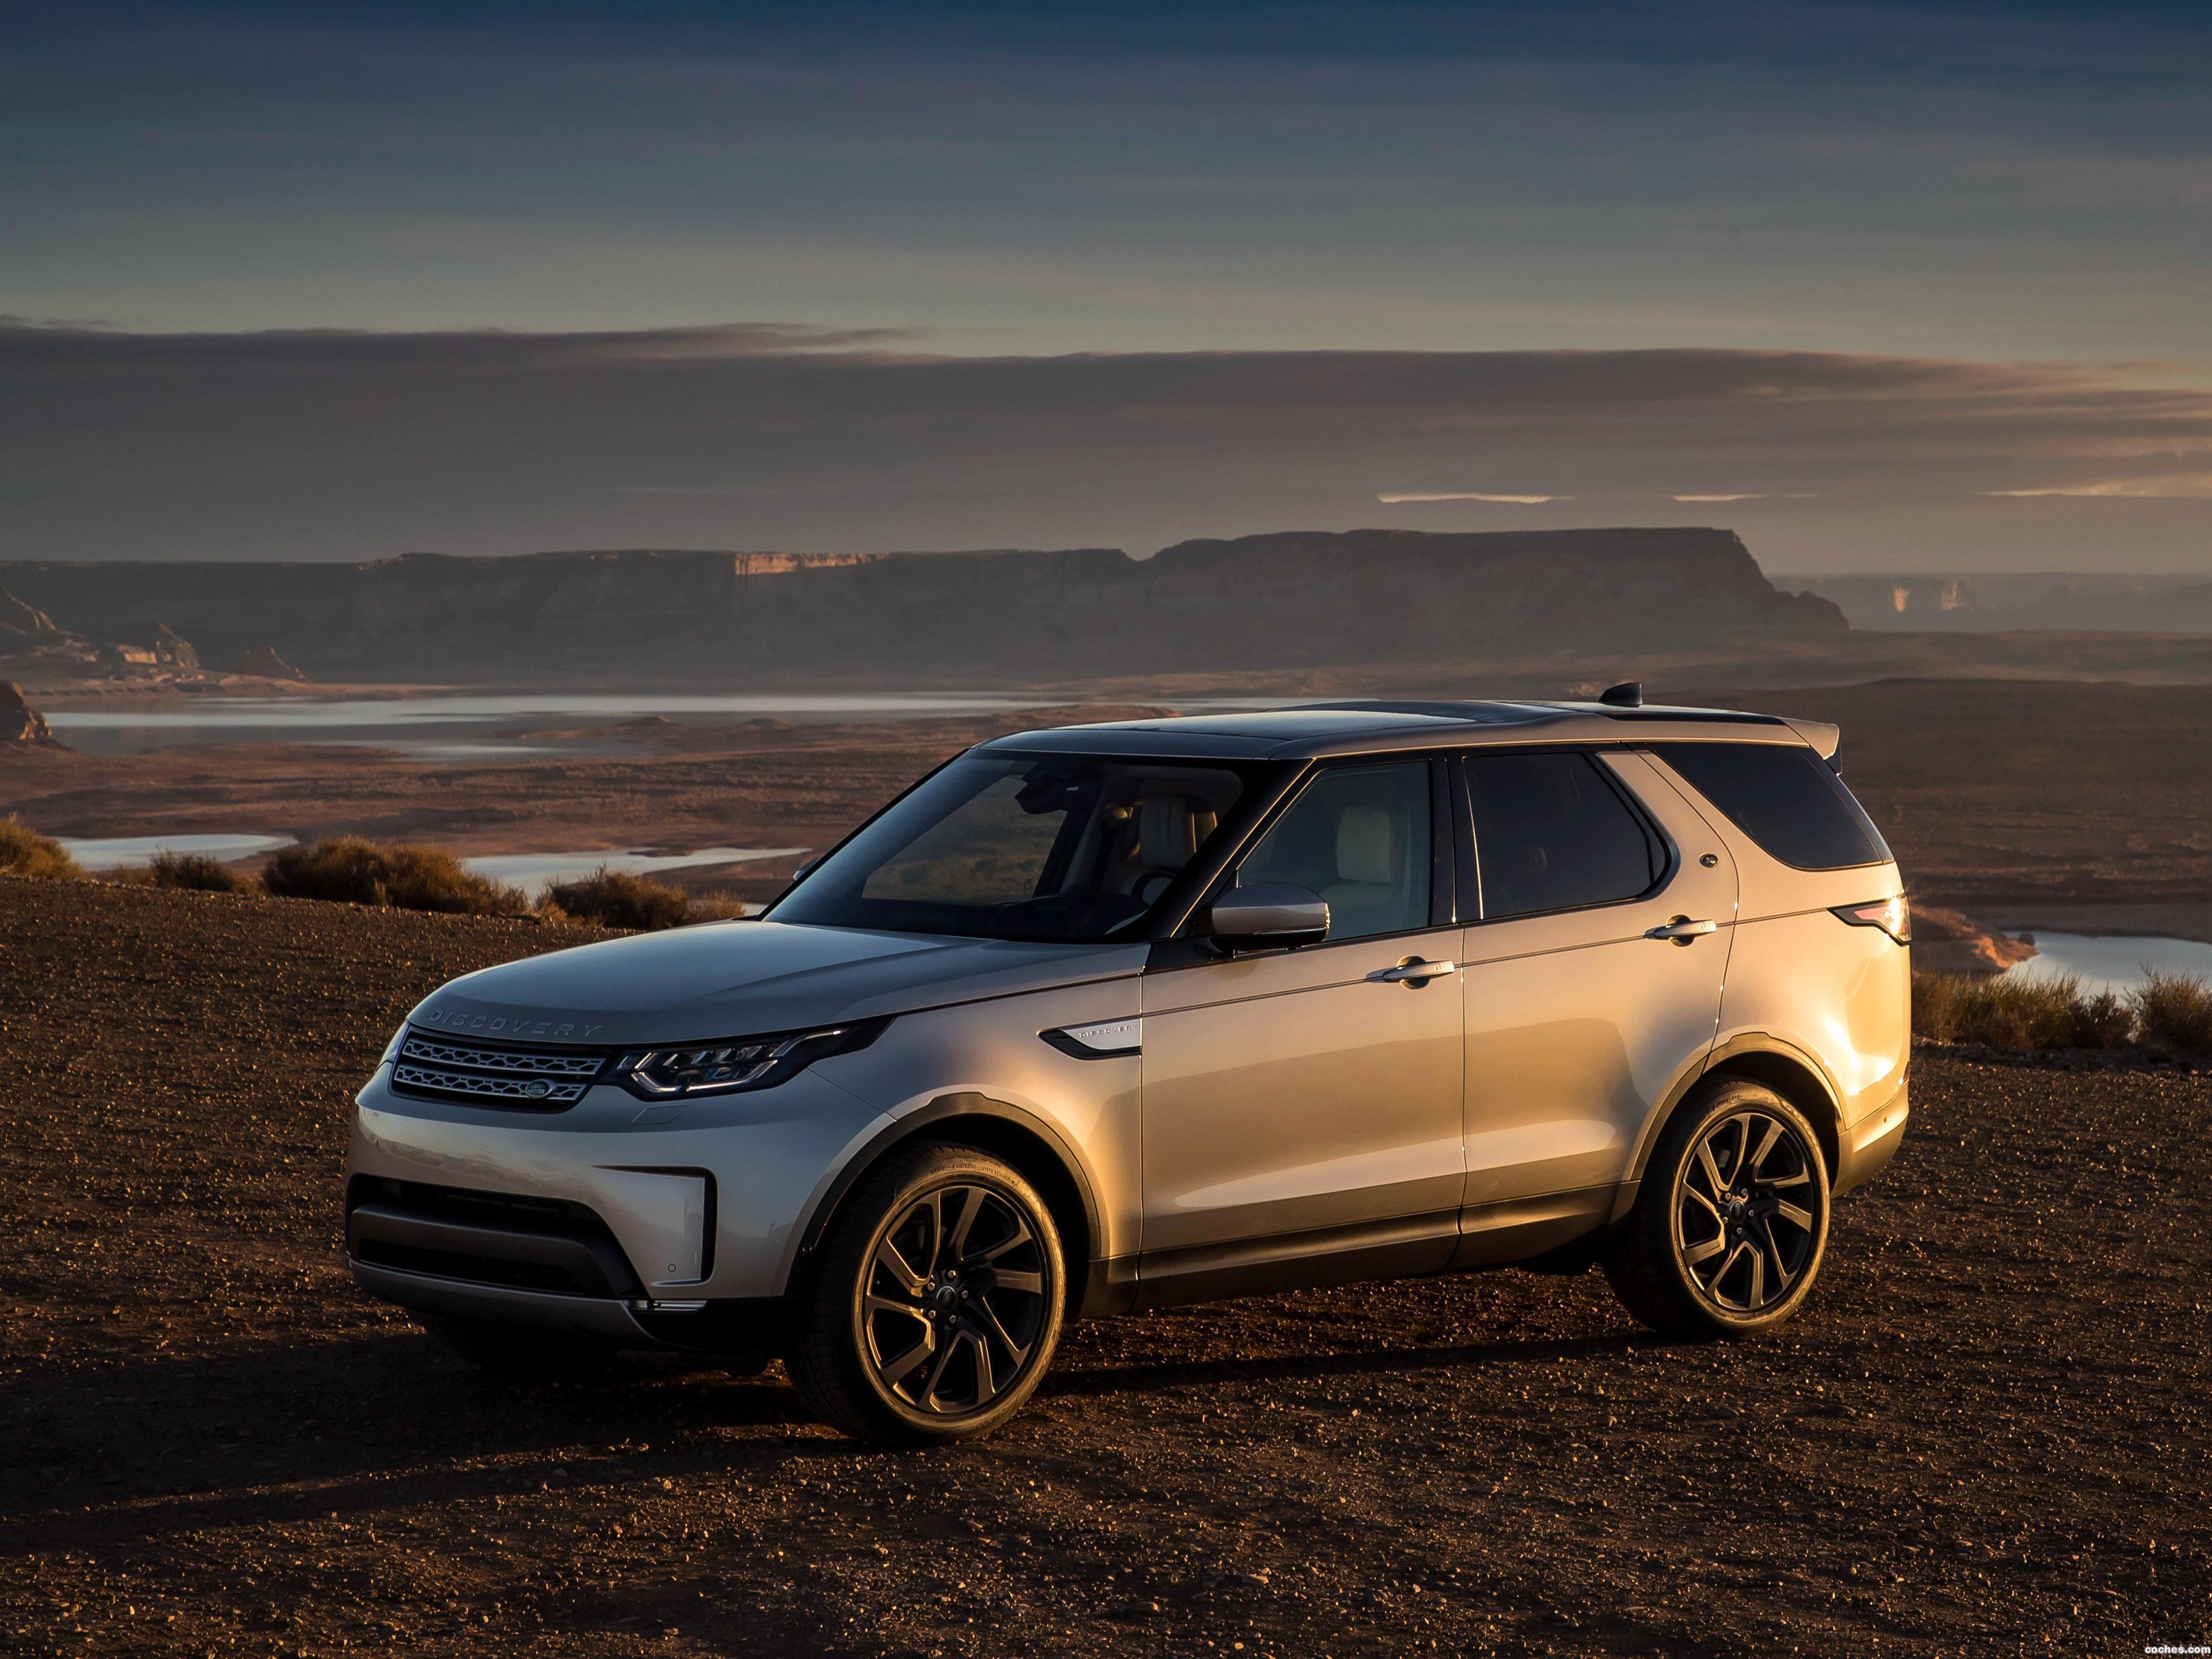 Foto 5 de Land Rover Discovery HSE 2017